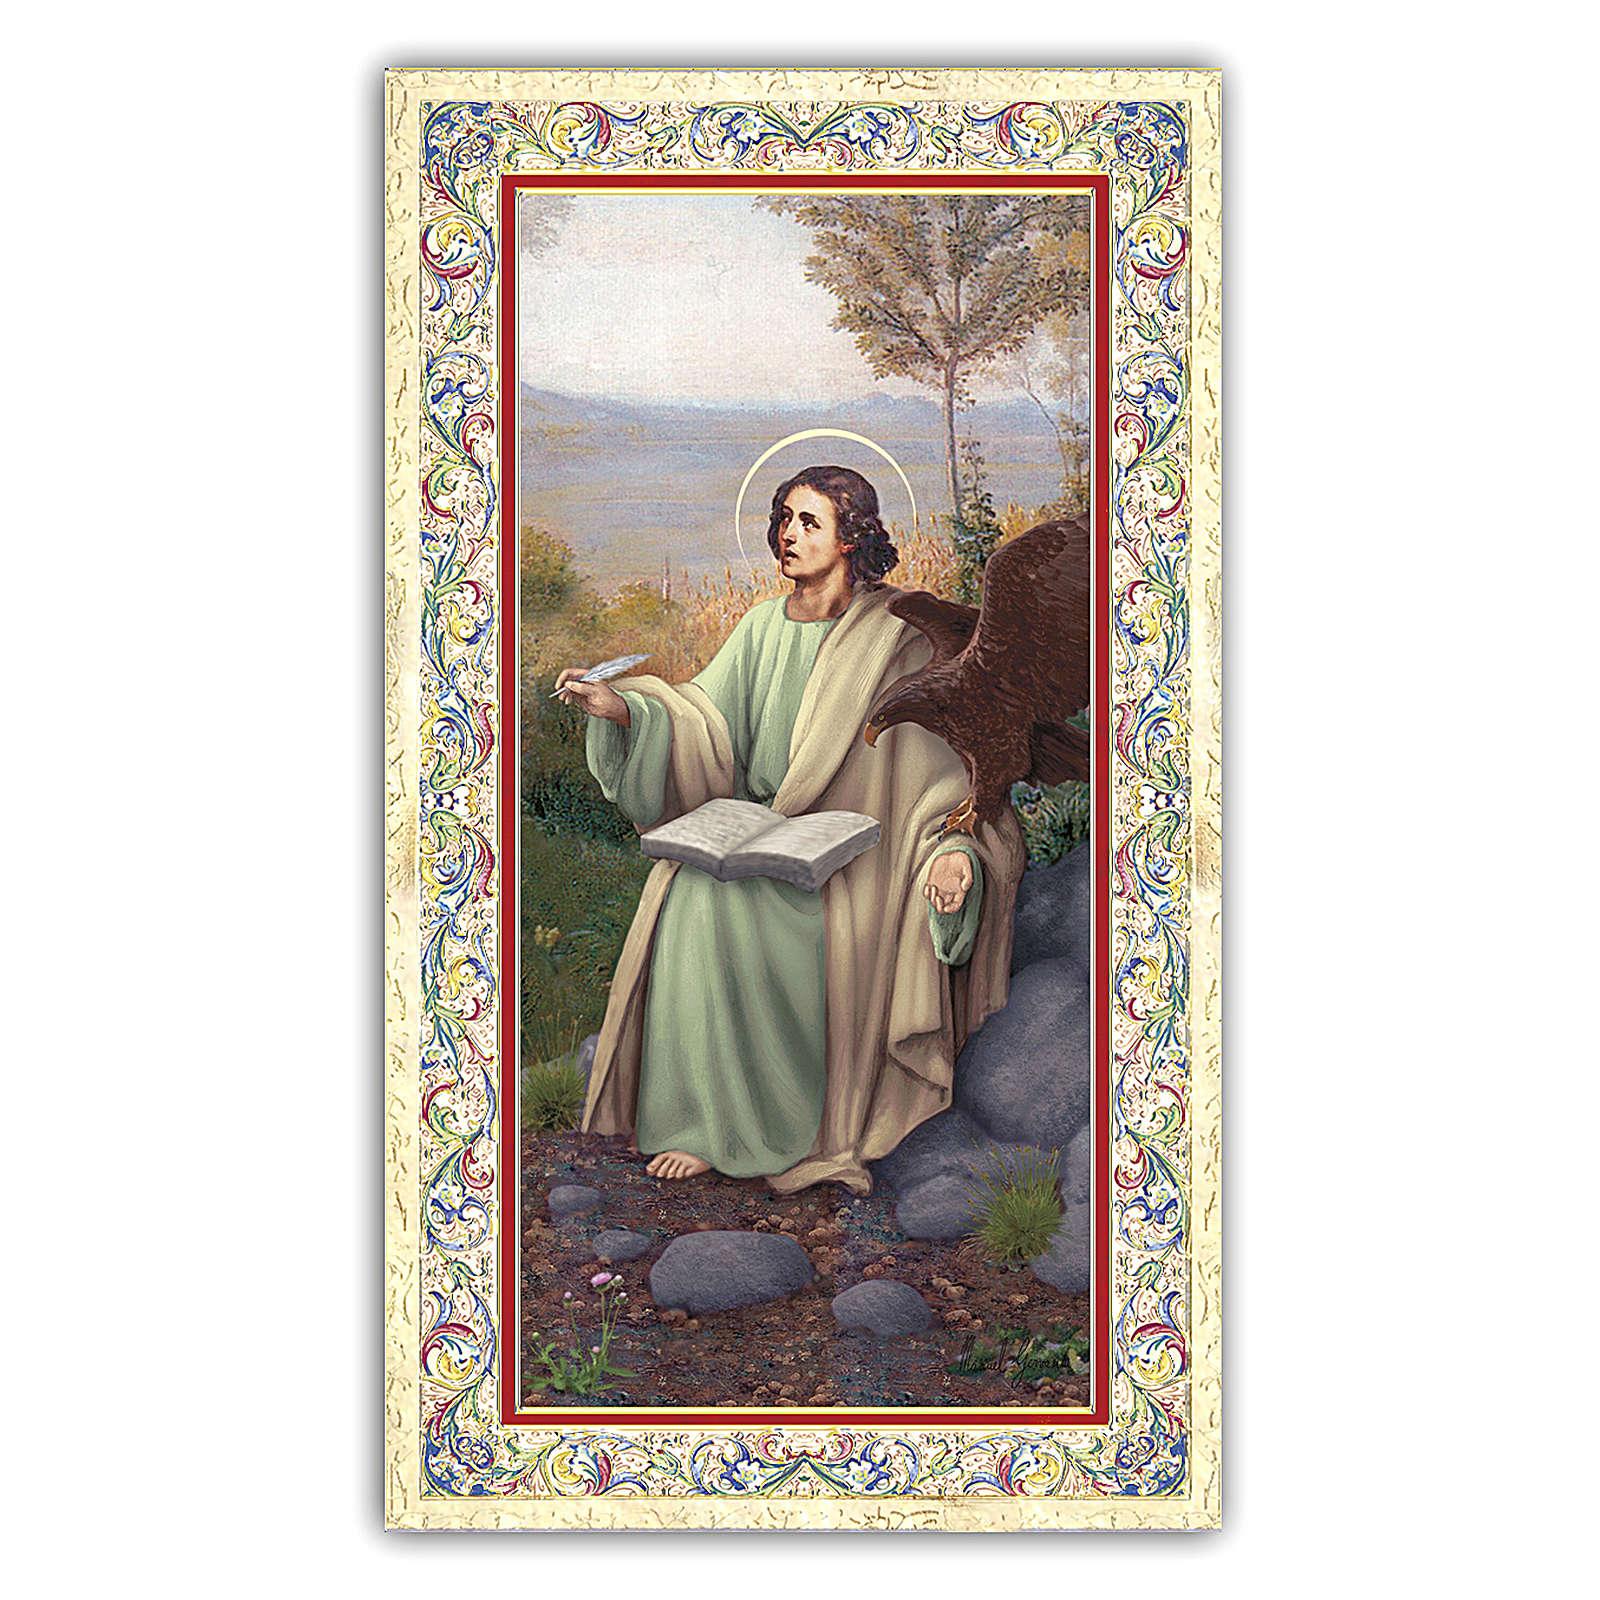 Santino San Giovanni Evangelista 10x5 cm ITA 4